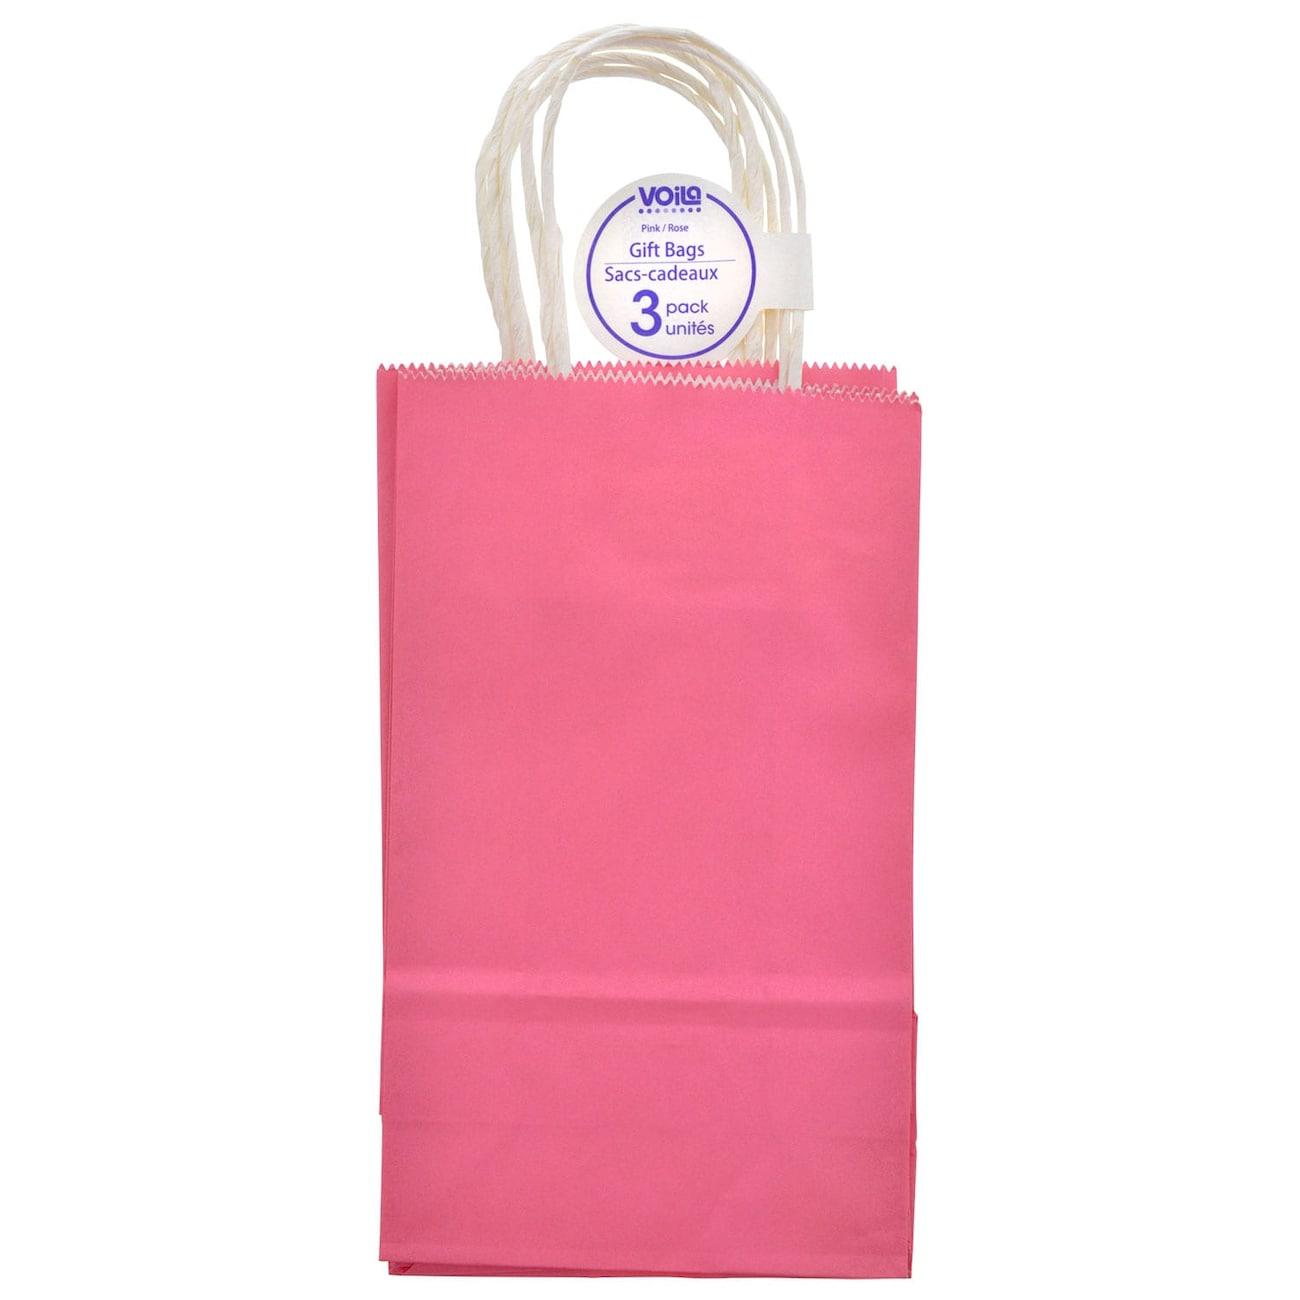 Pink Gift Bags - Dollar Tree, Inc.